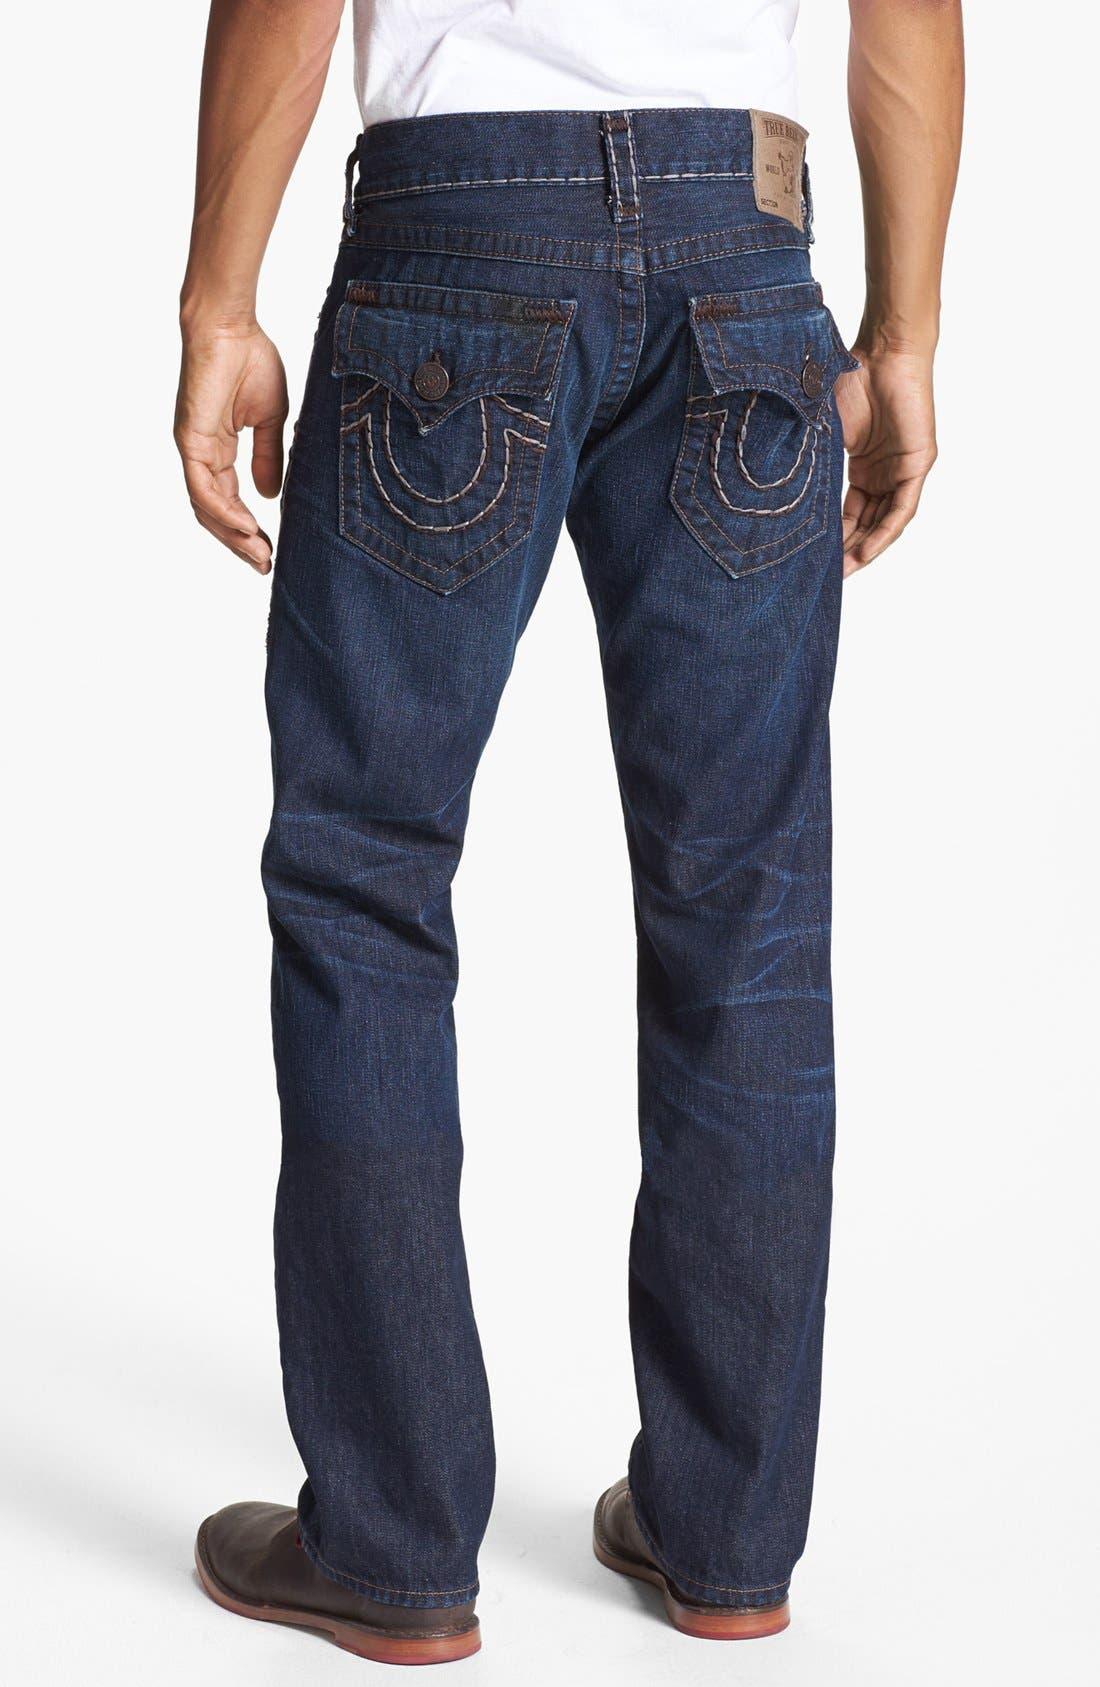 Alternate Image 1 Selected - True Religion Brand Jeans 'Ricky' Straight Leg Jeans (Retribution)